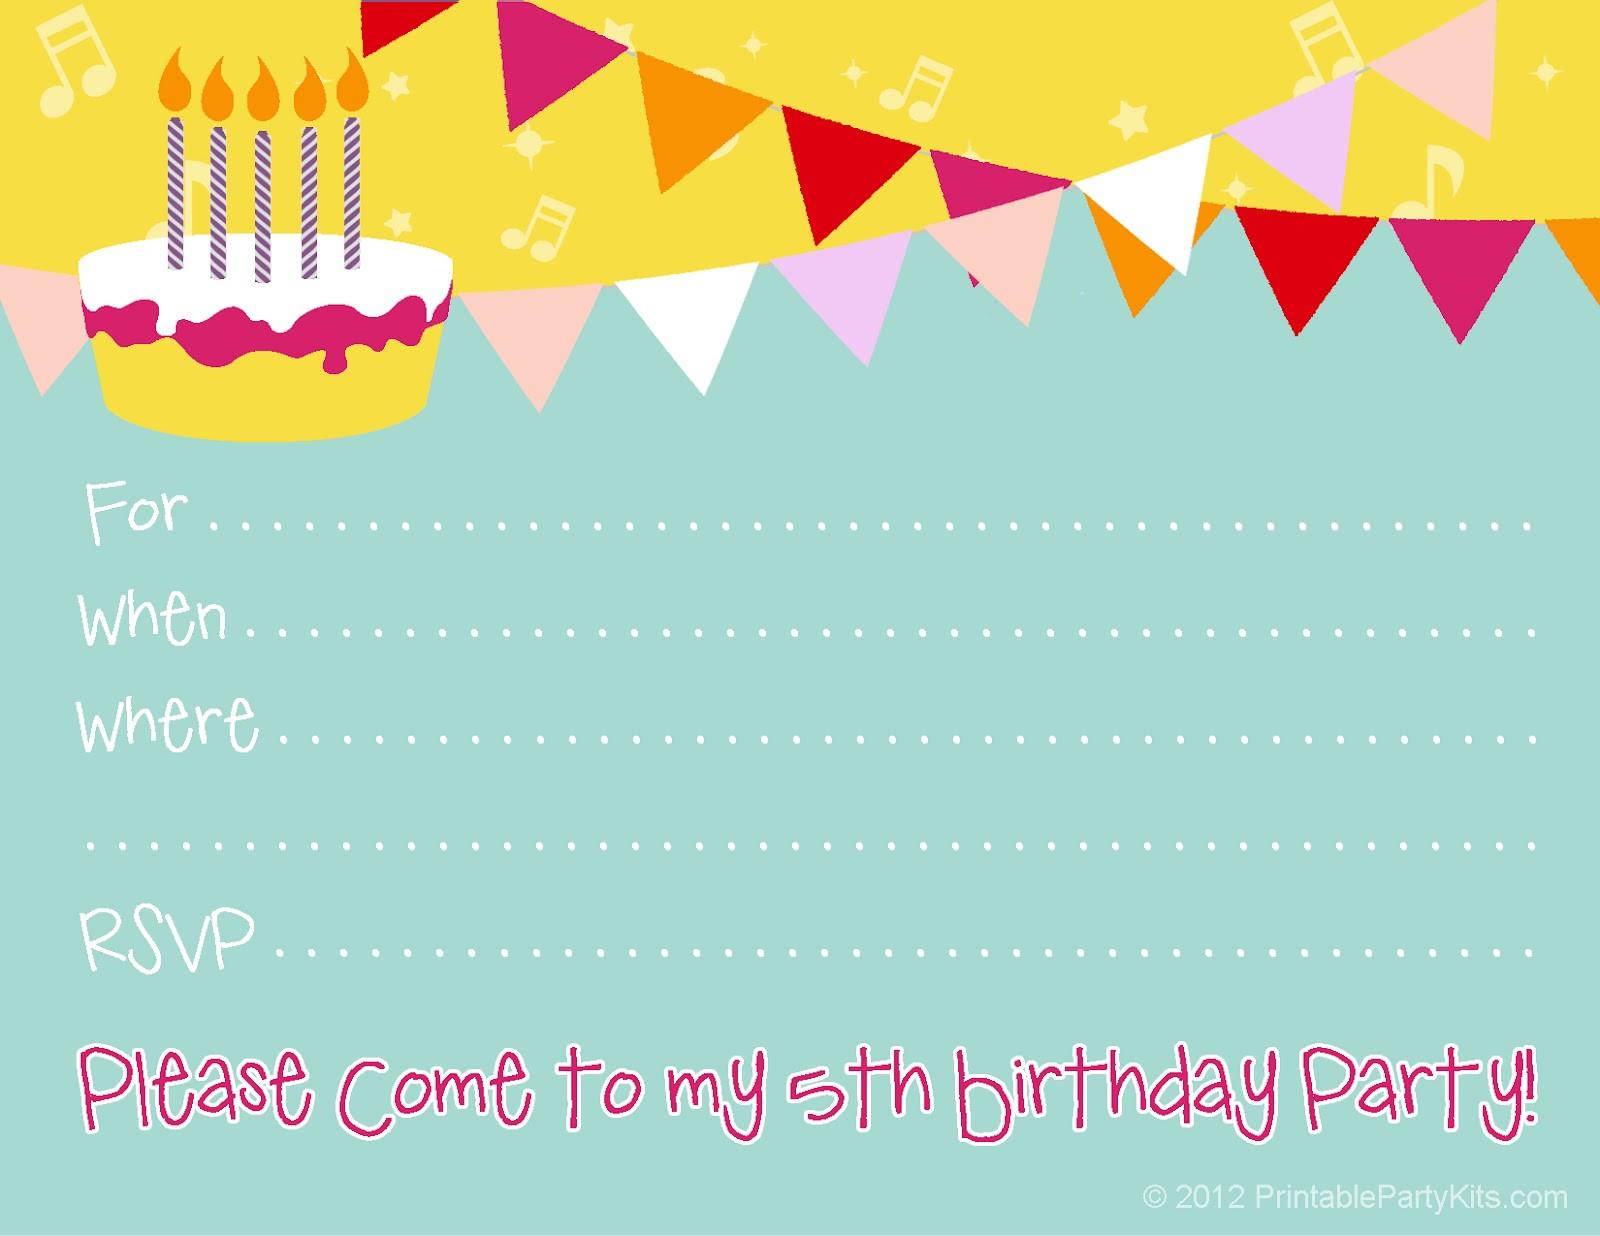 Invitation Birthday Party  Free Birthday Party Invitations for Girl – FREE Printable